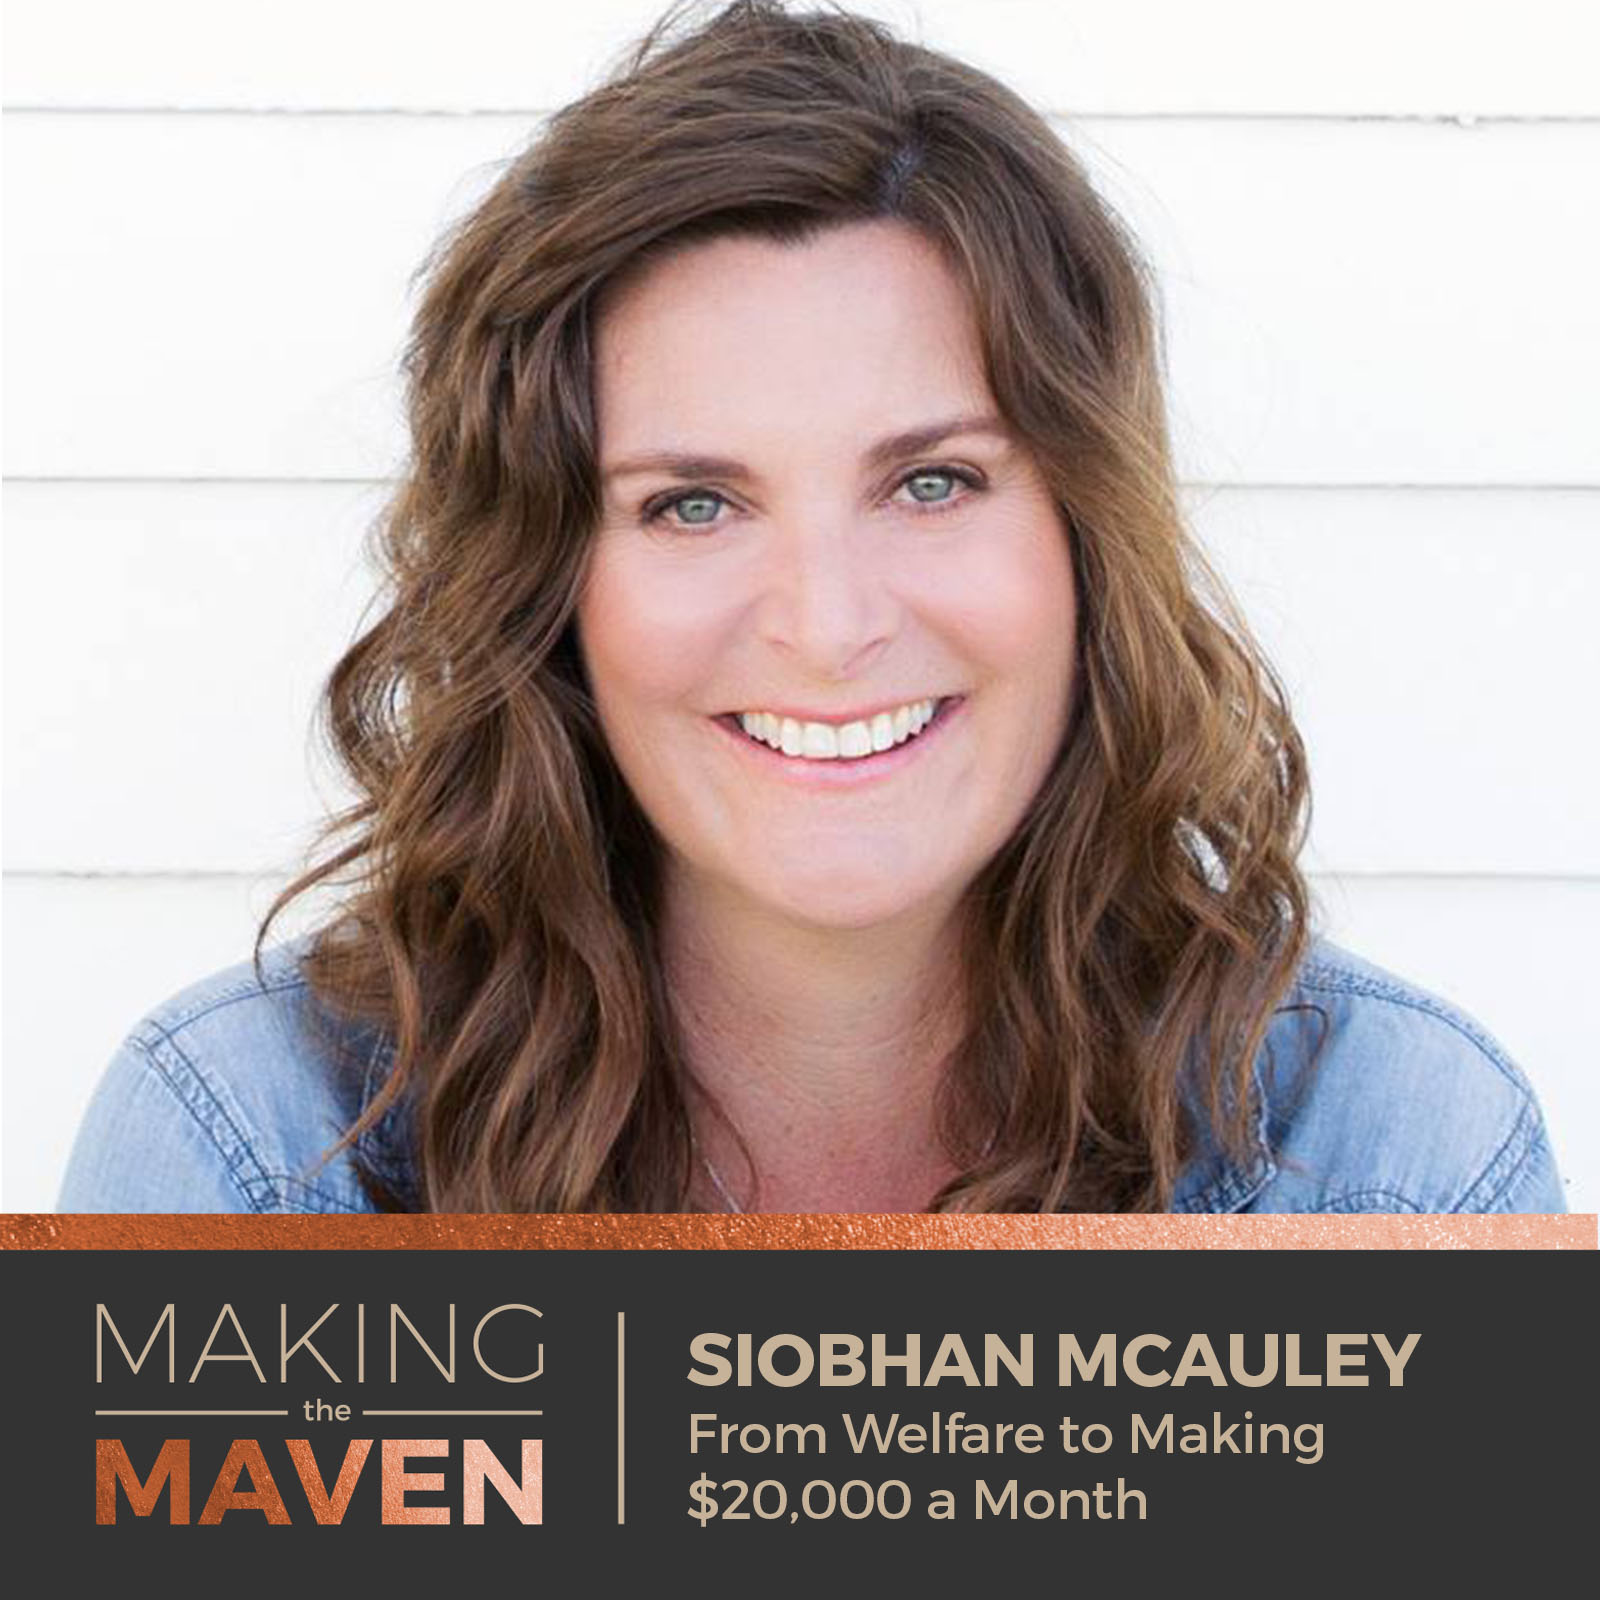 Siobhan McAuley